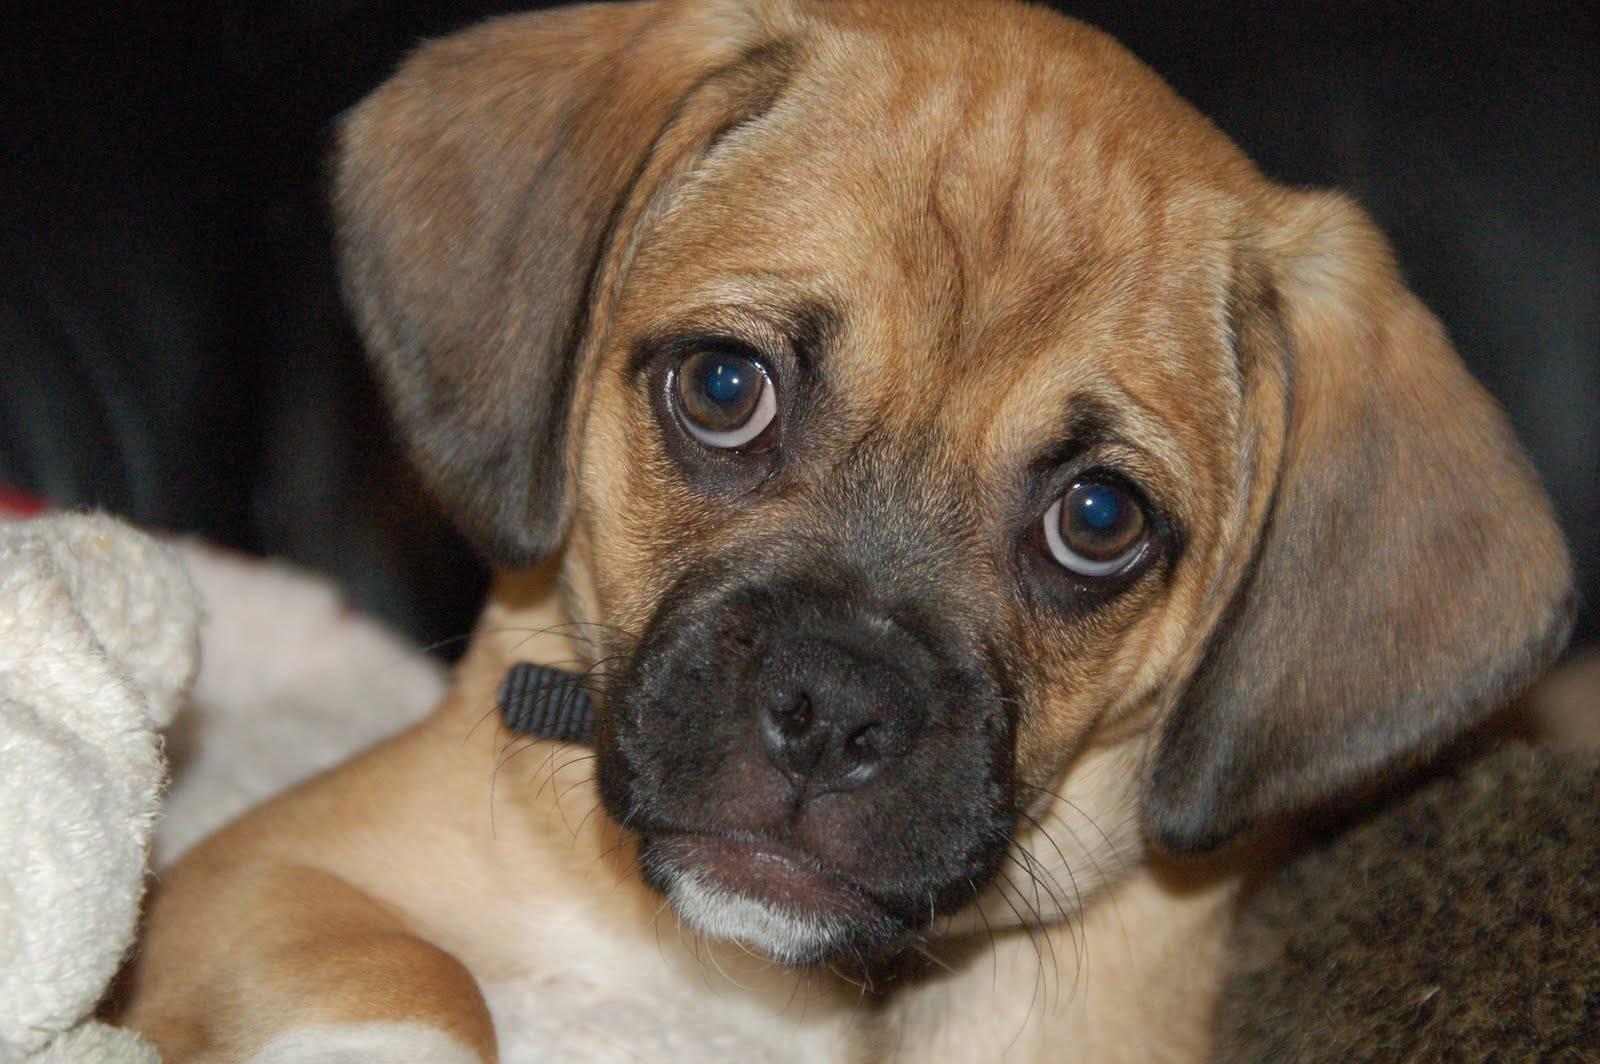 Пагль - фото, характер и описание породы. фото, видео и цена собак паглей - смеси бигля и мопса. - petstime.ru